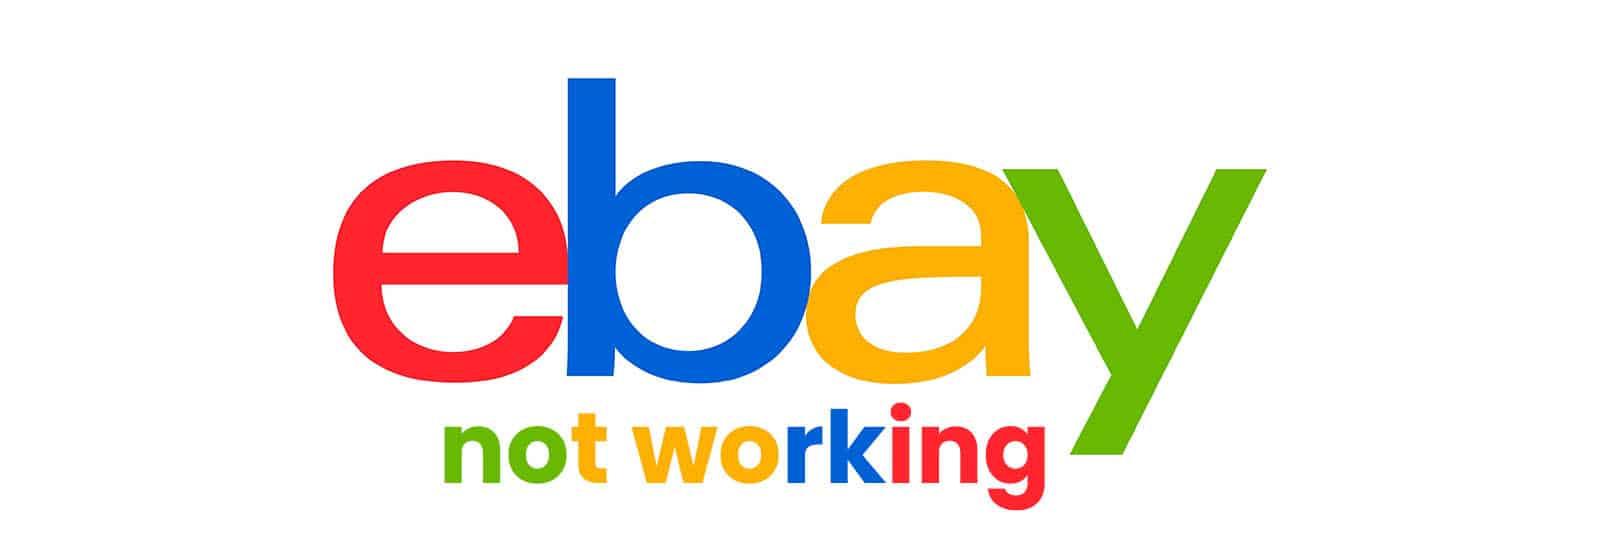 ebay-not-working